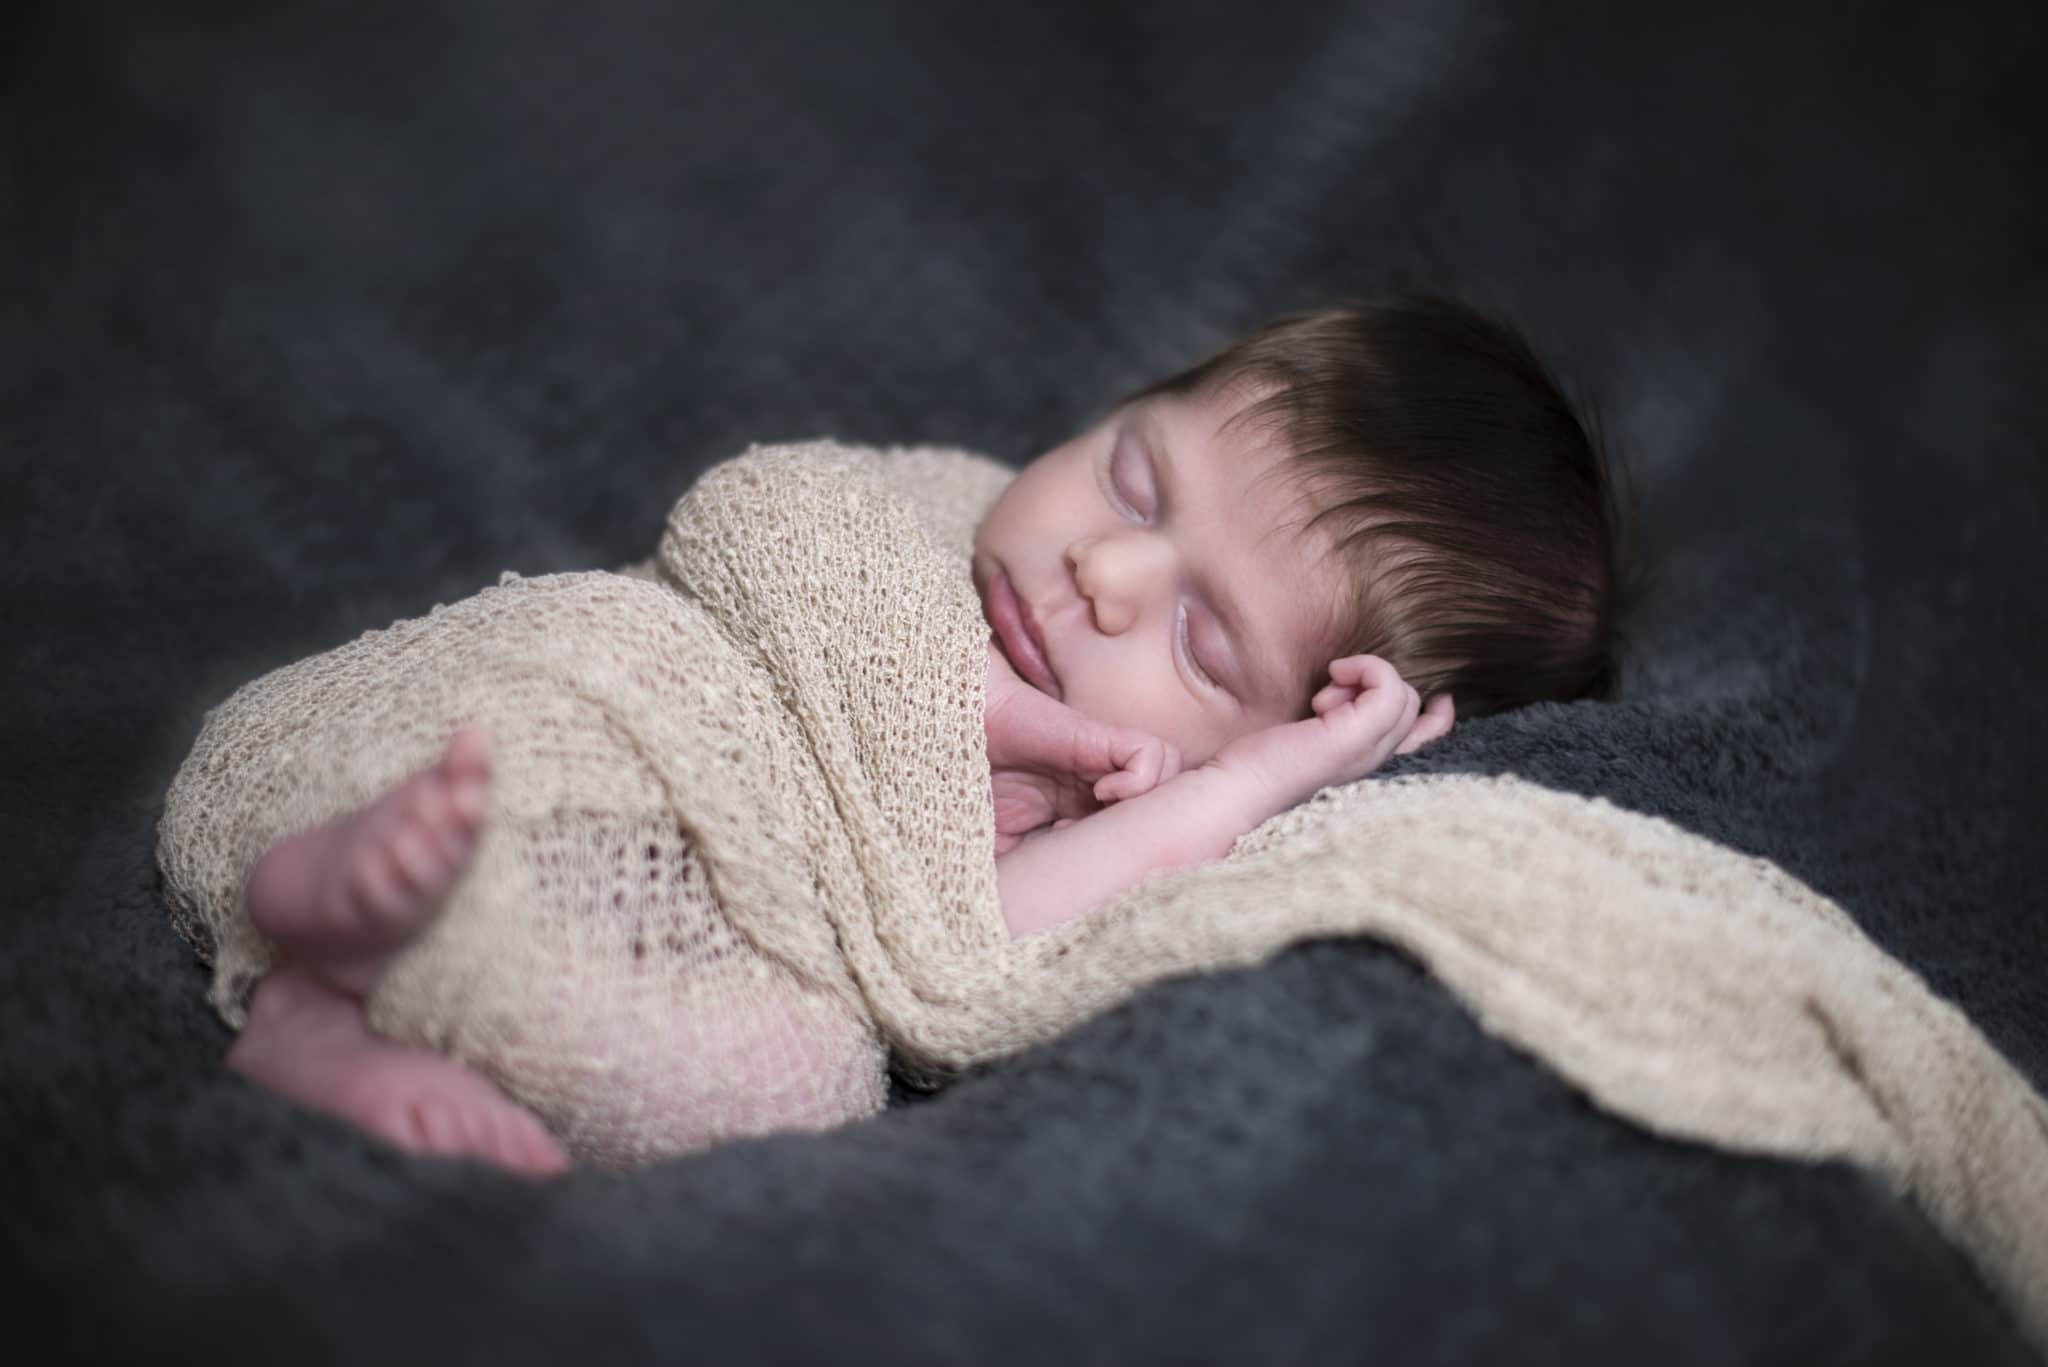 shooting-nouveau-ne-maternite-bebe-studio-seance-grossesse-lausanne-photo-photographe